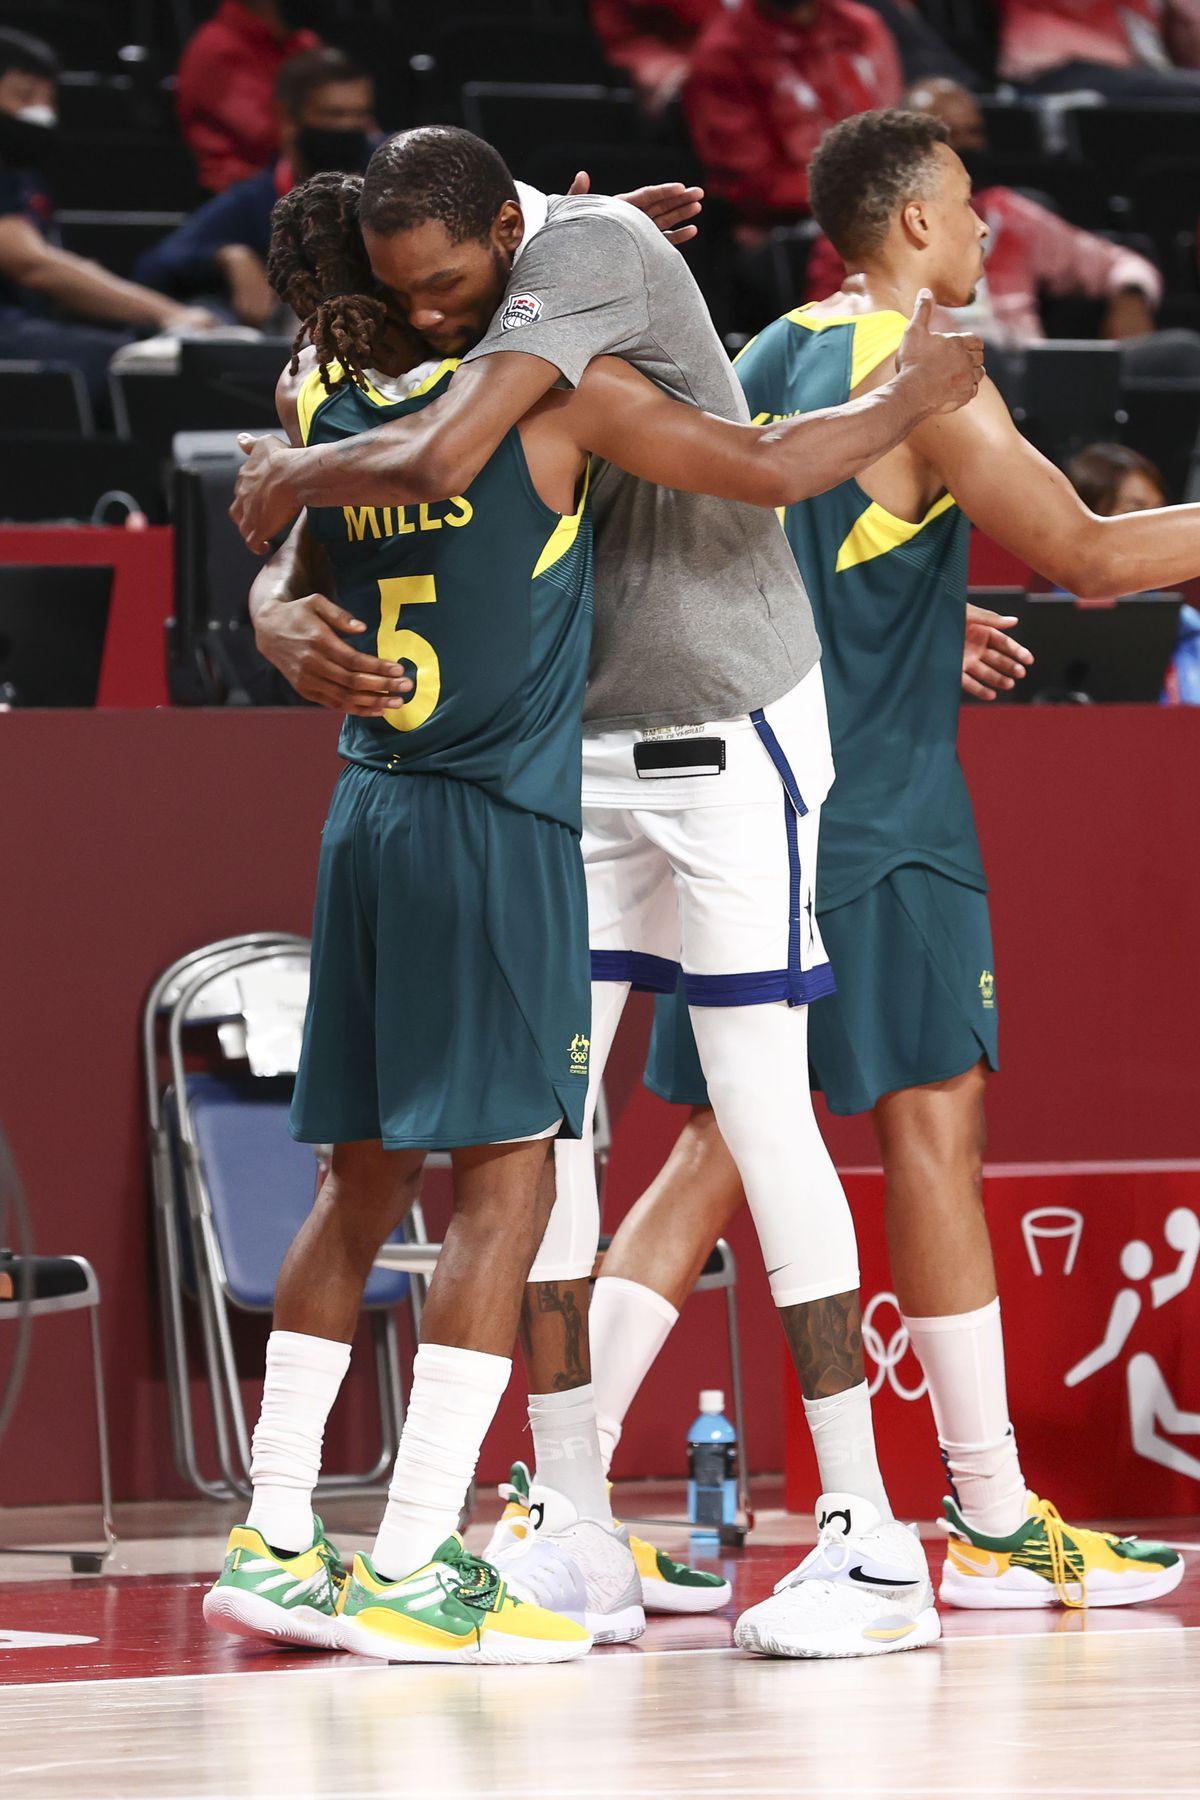 2020 Tokyo Olympics: United States v Australia